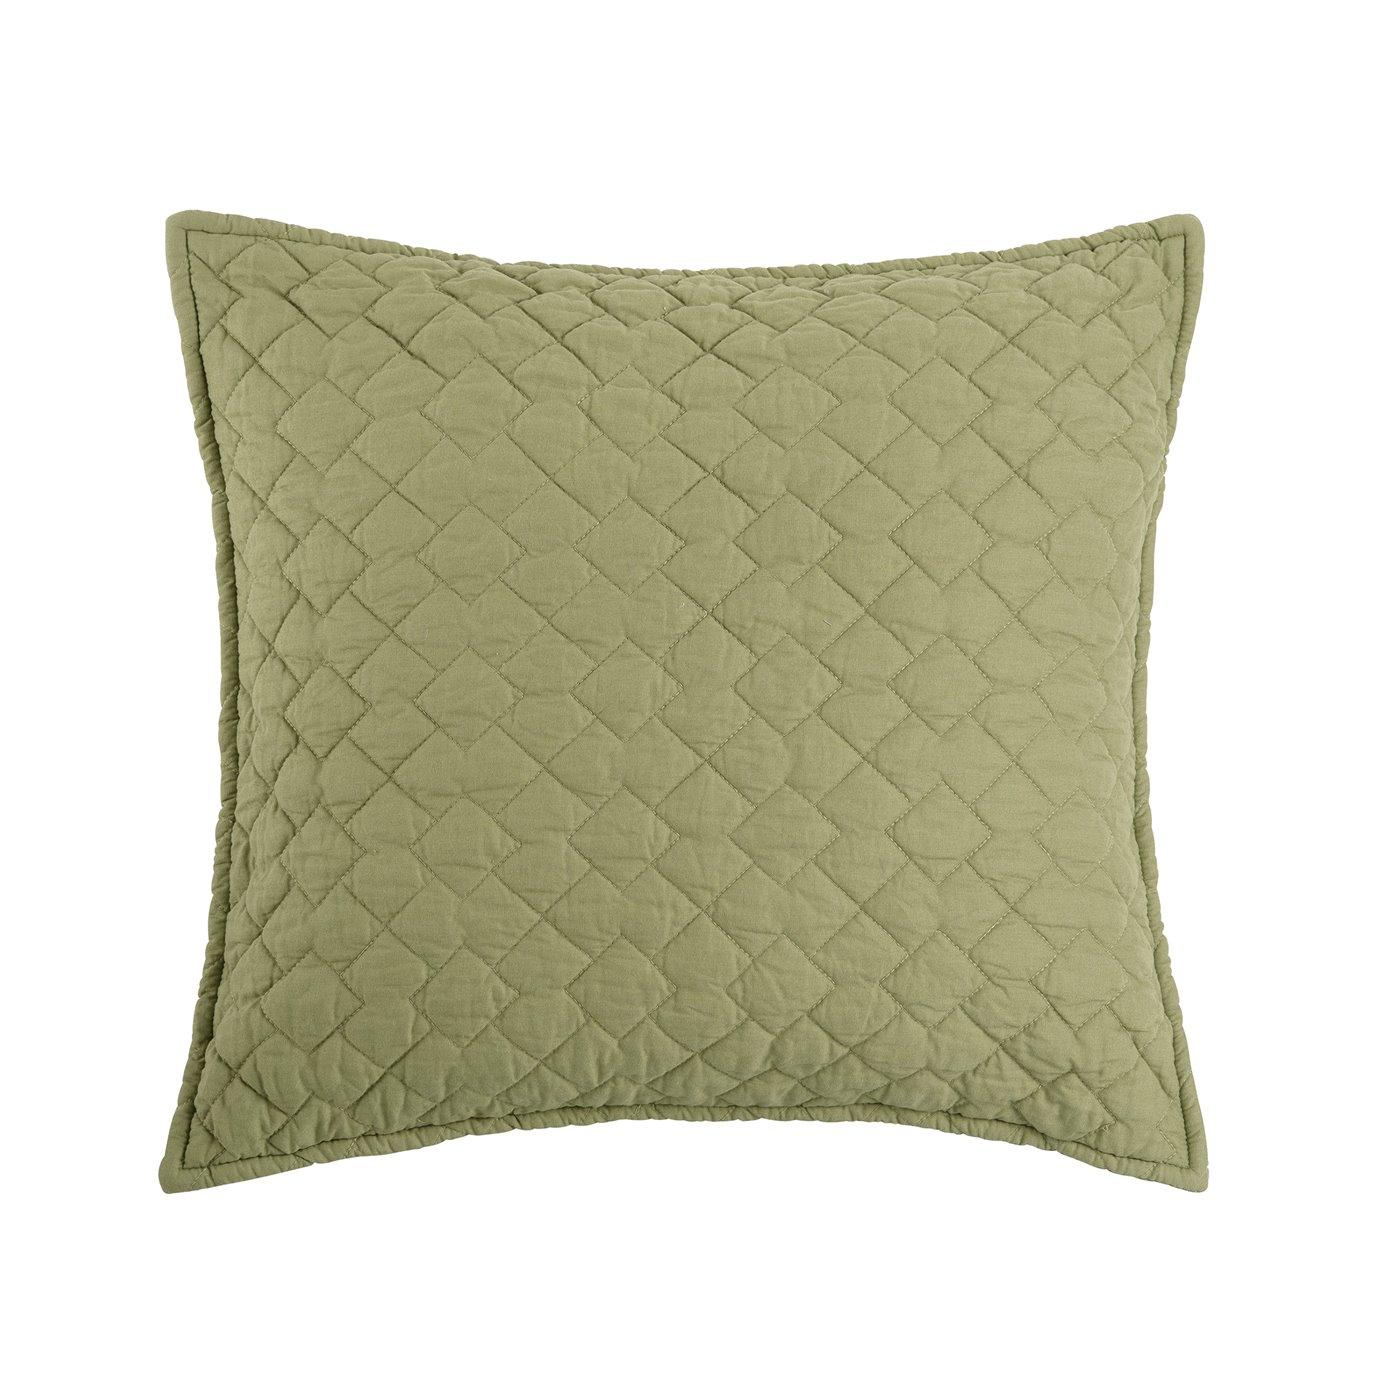 Regent Tarragon Pillow